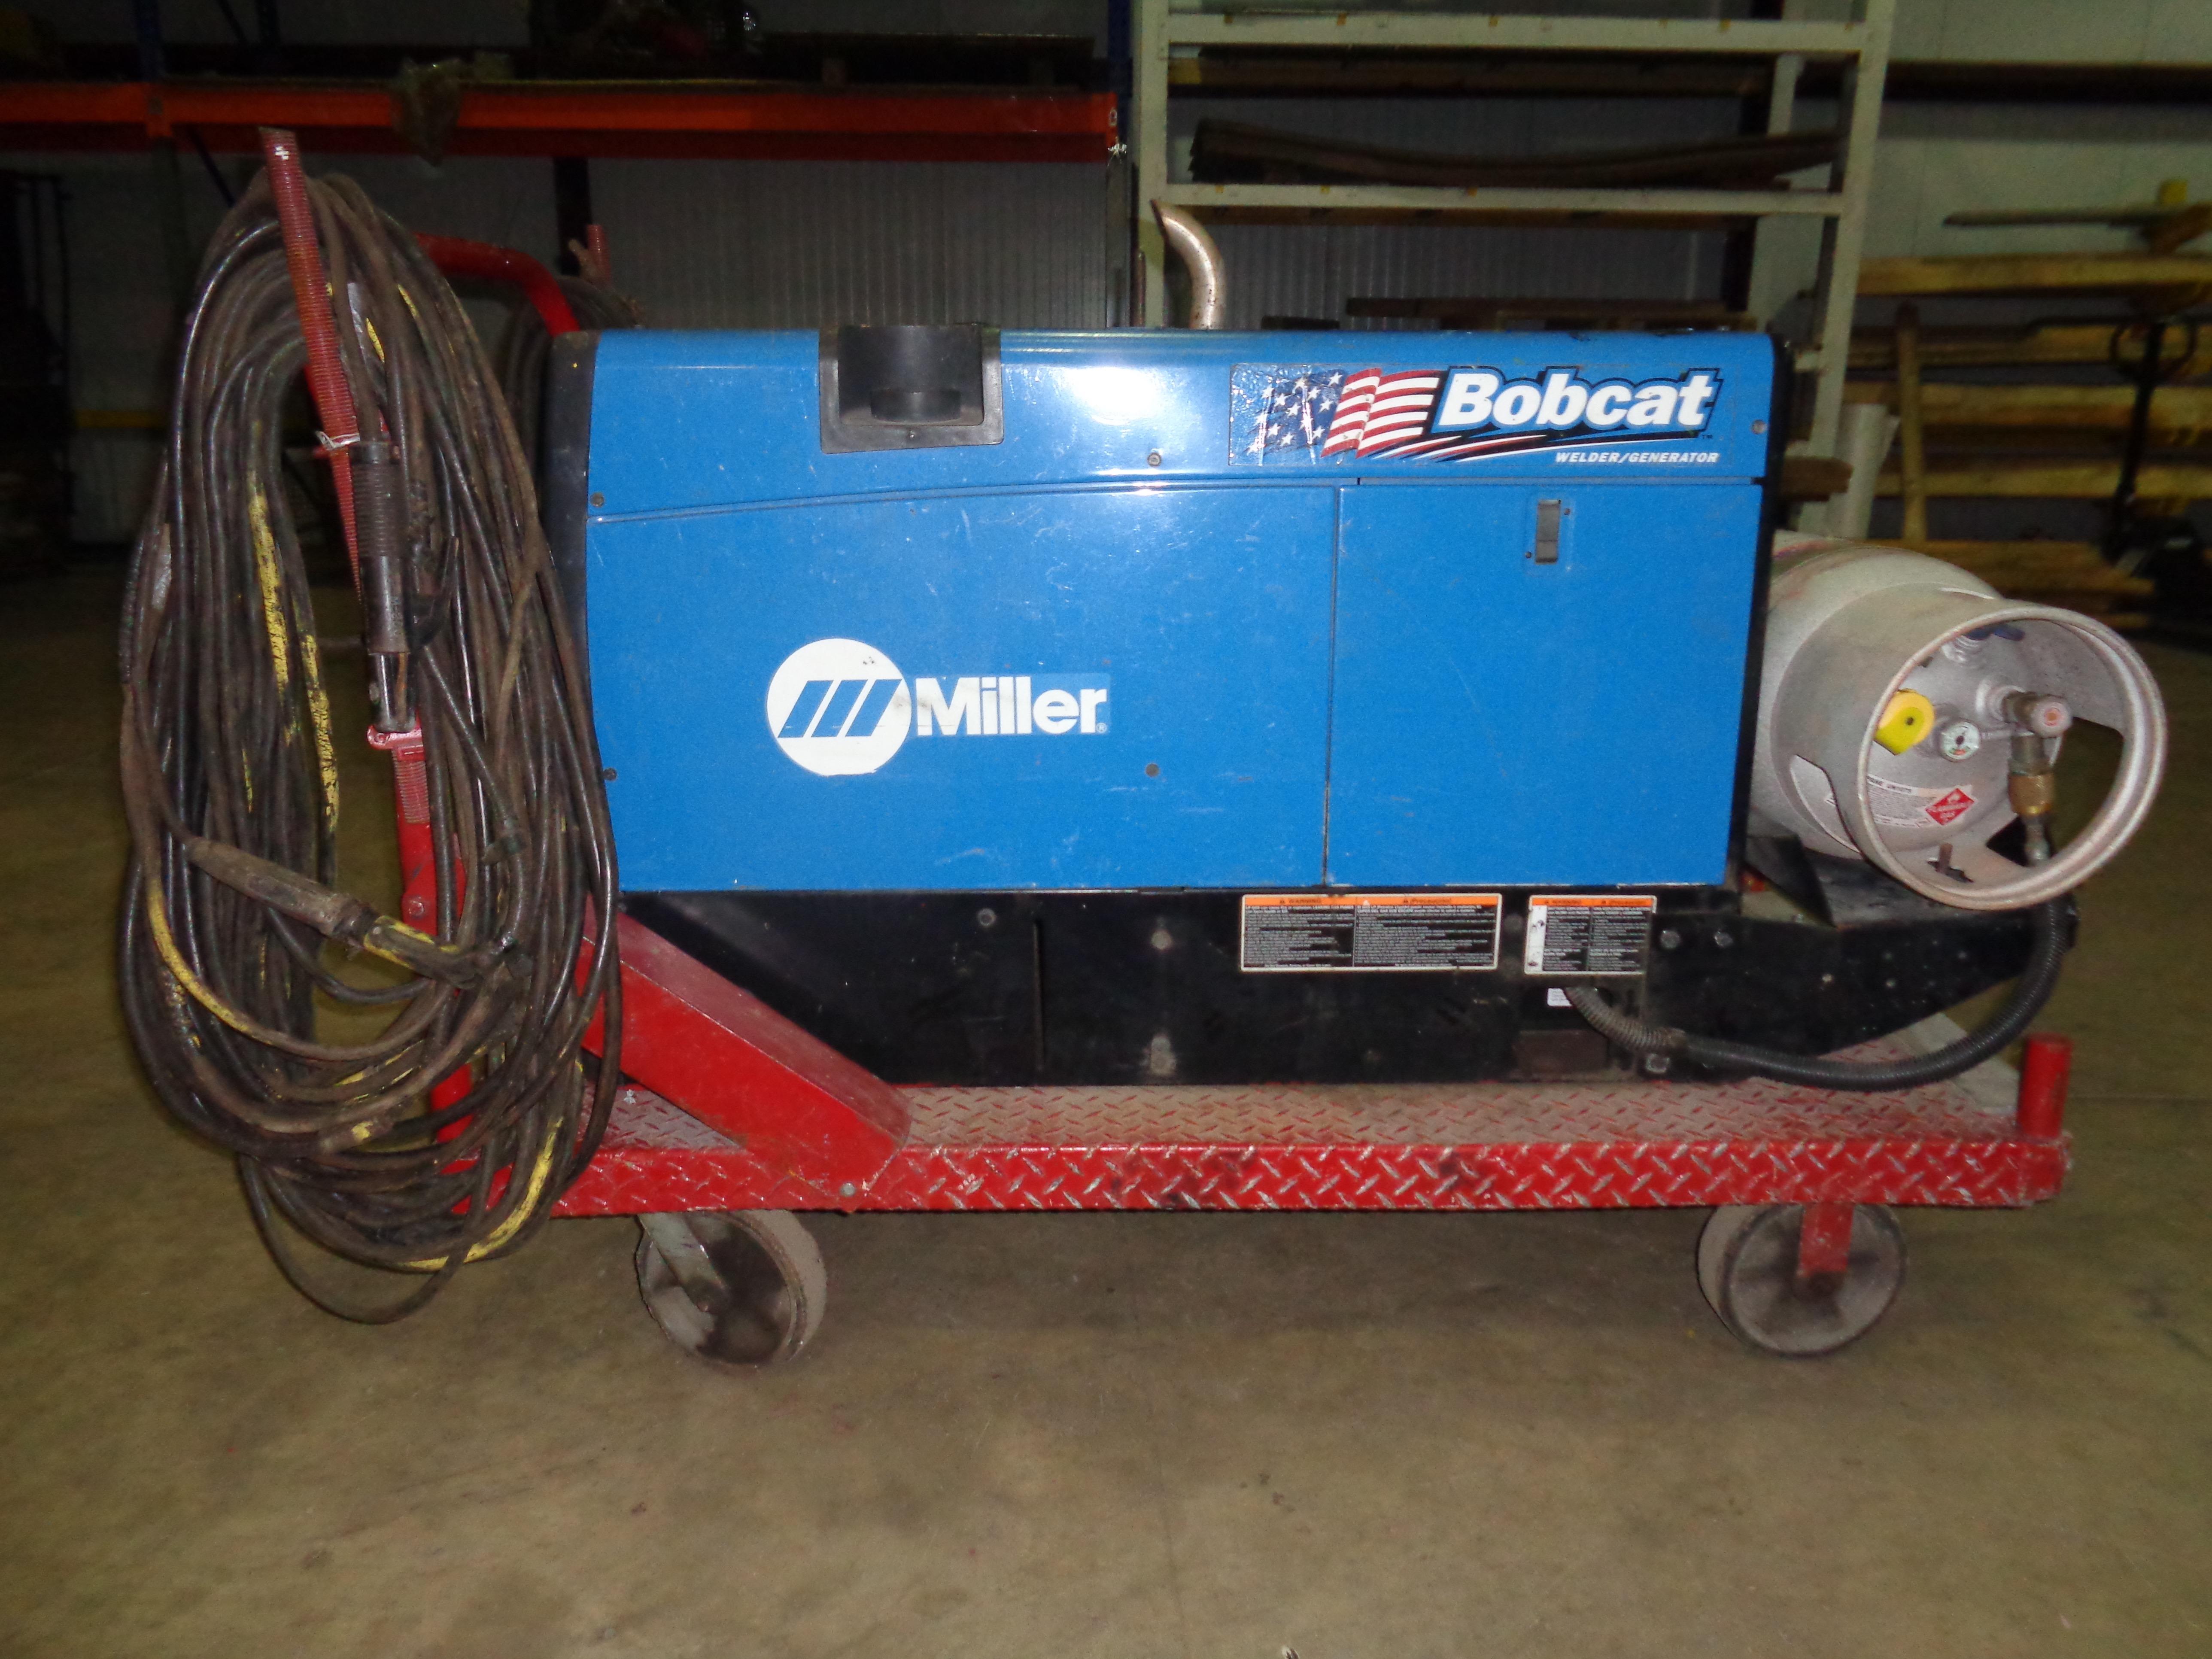 Miller Bobcat 250 Welder - Image 2 of 5